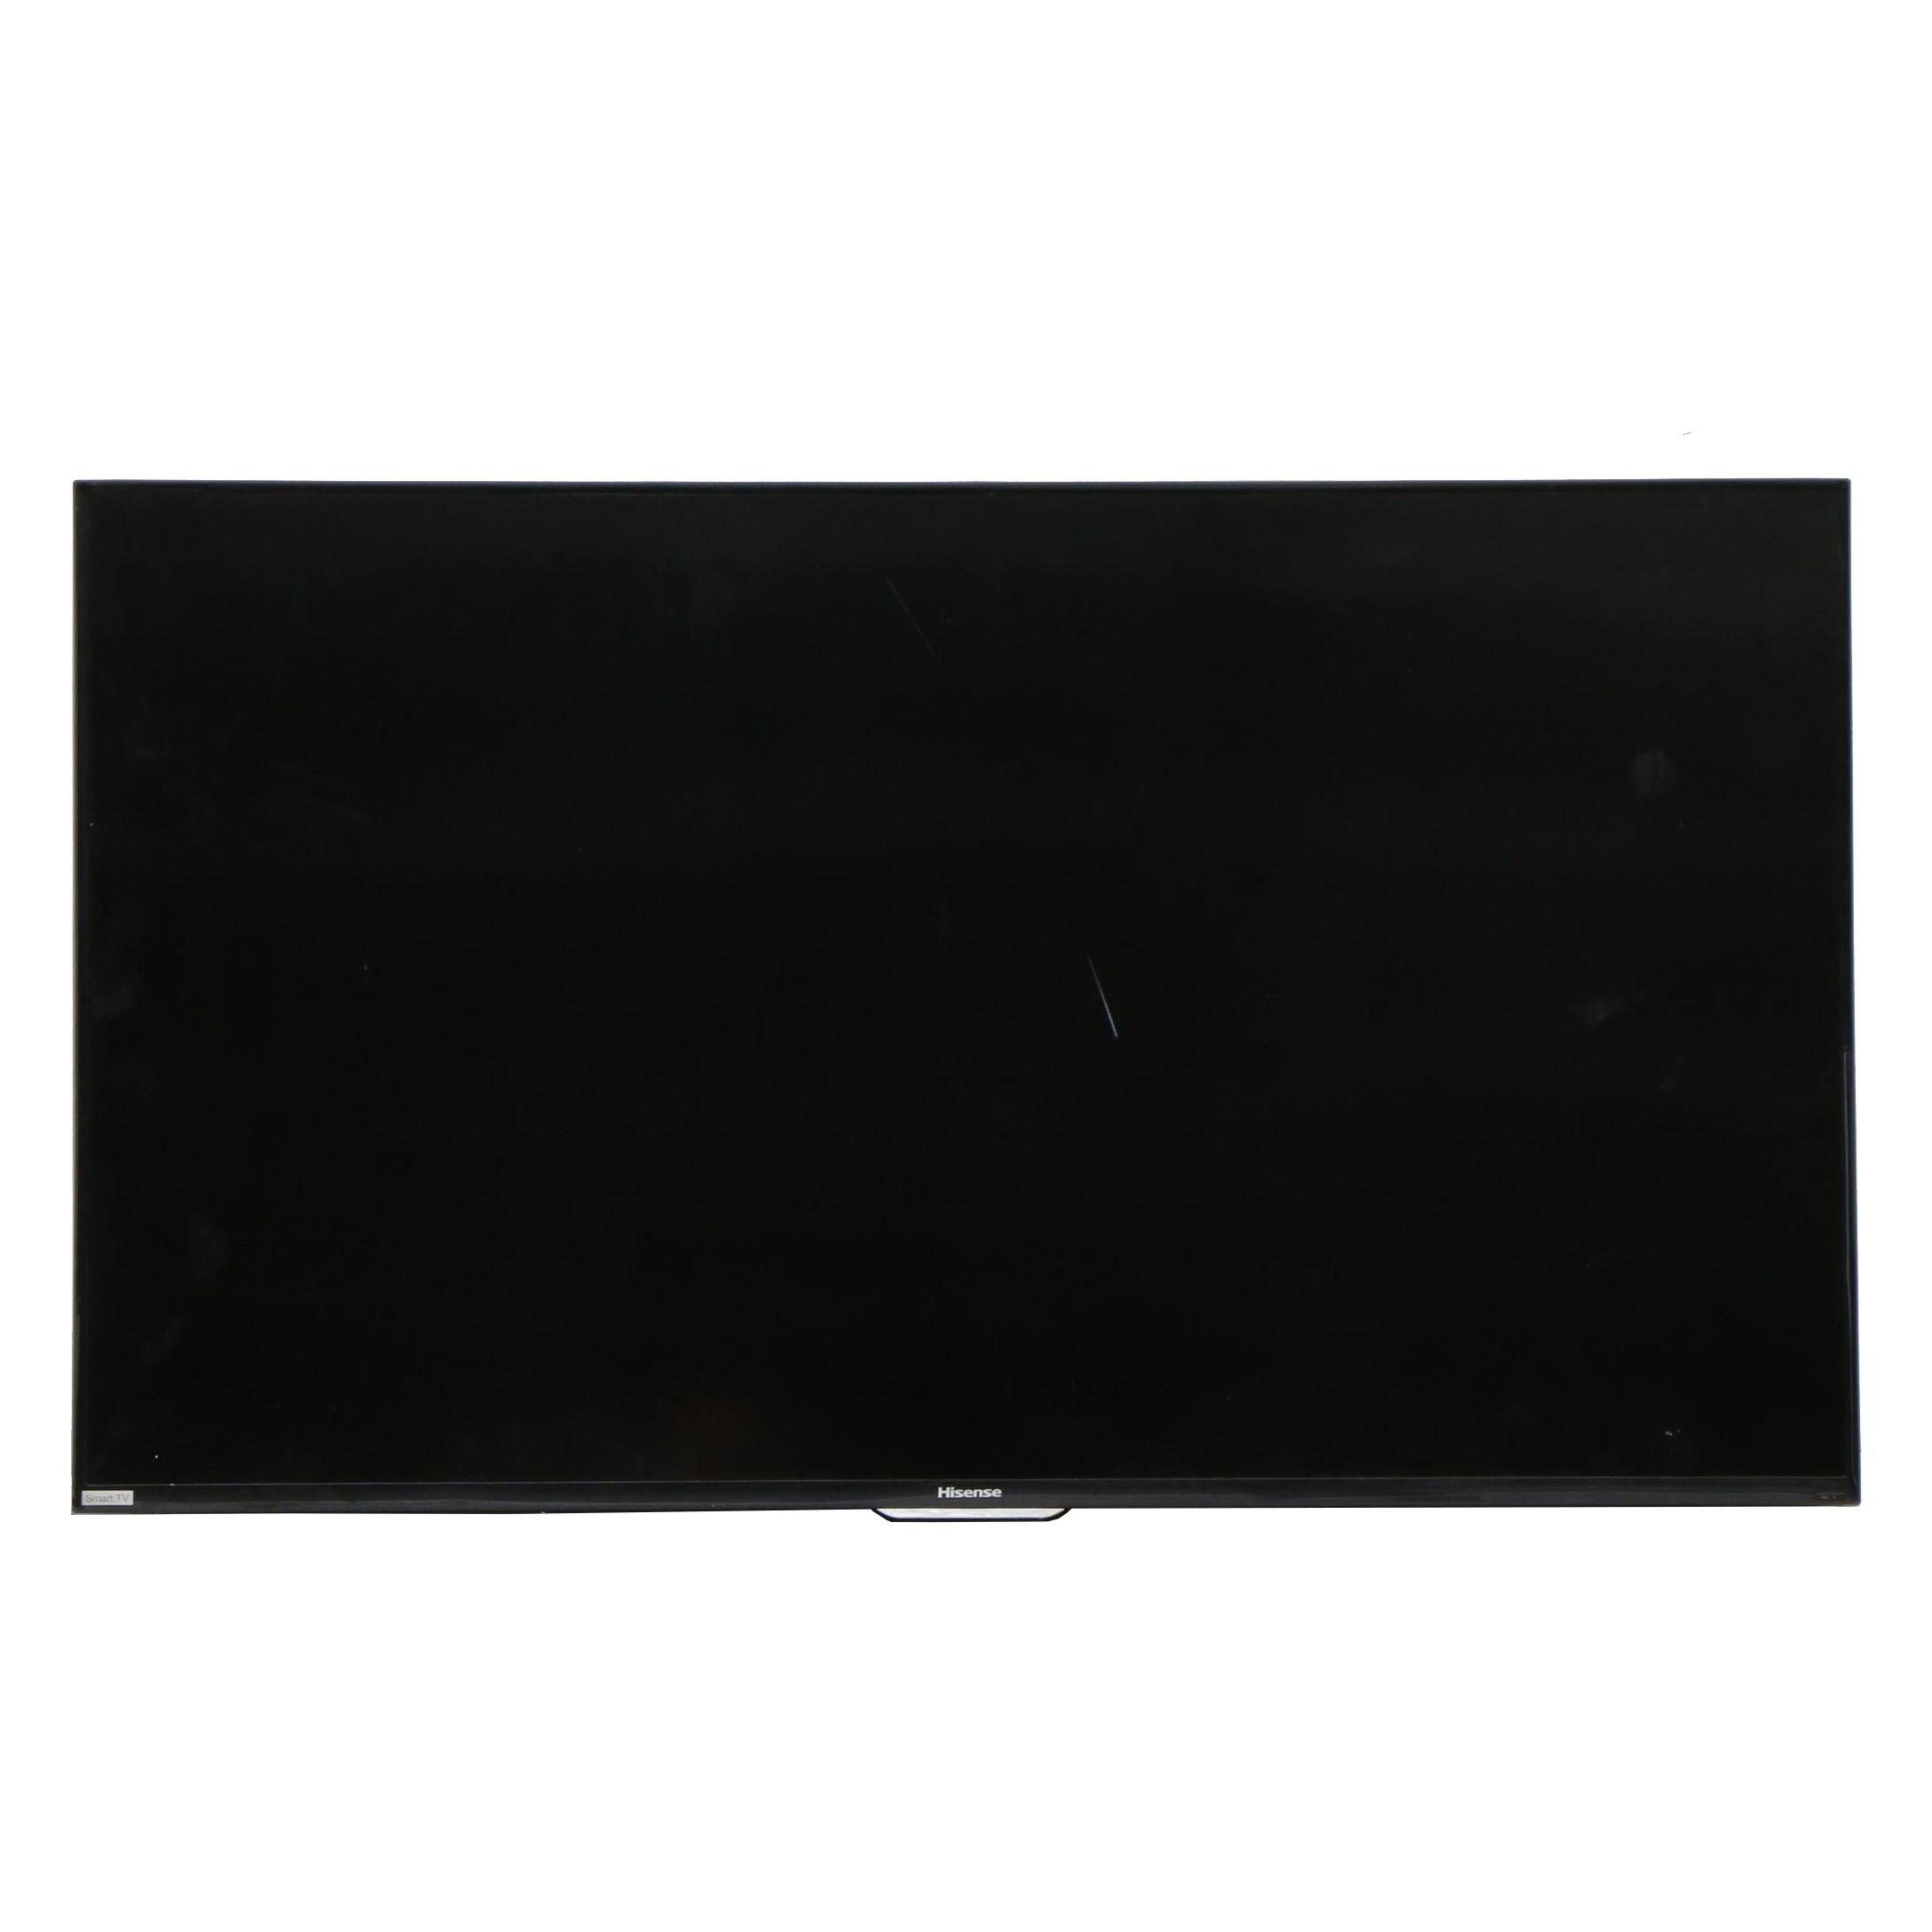 "Hisense 50"" Flatscreen LED LCD Television"